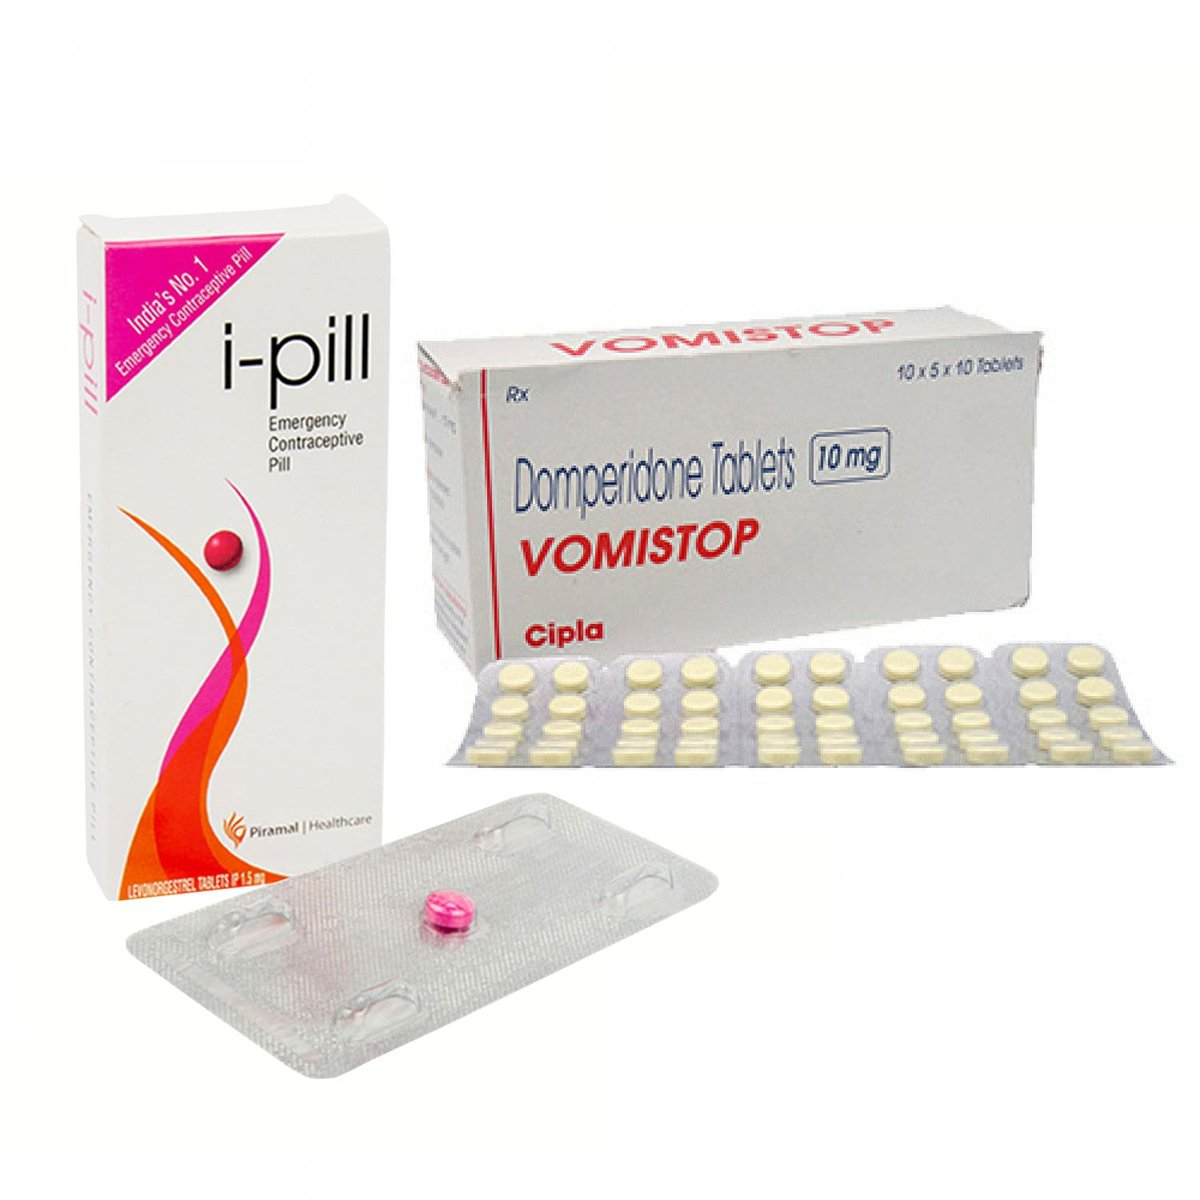 test ツイッターメディア - / 📢 アイピルは世界的に有名なアフターピル❗️ \  日本の医療機関でも取り扱いのあるアフターピル「ノルレボ」のジェネリック医薬品です。 🎉  1⃣ 性交後72時間に服用することで、100%に近い確率で妊娠を回避 2⃣常備薬として #ジェネリック医薬品 #避妊 #アフターピル https://t.co/wWDgejB8cX https://t.co/XAr0uaSQ6s